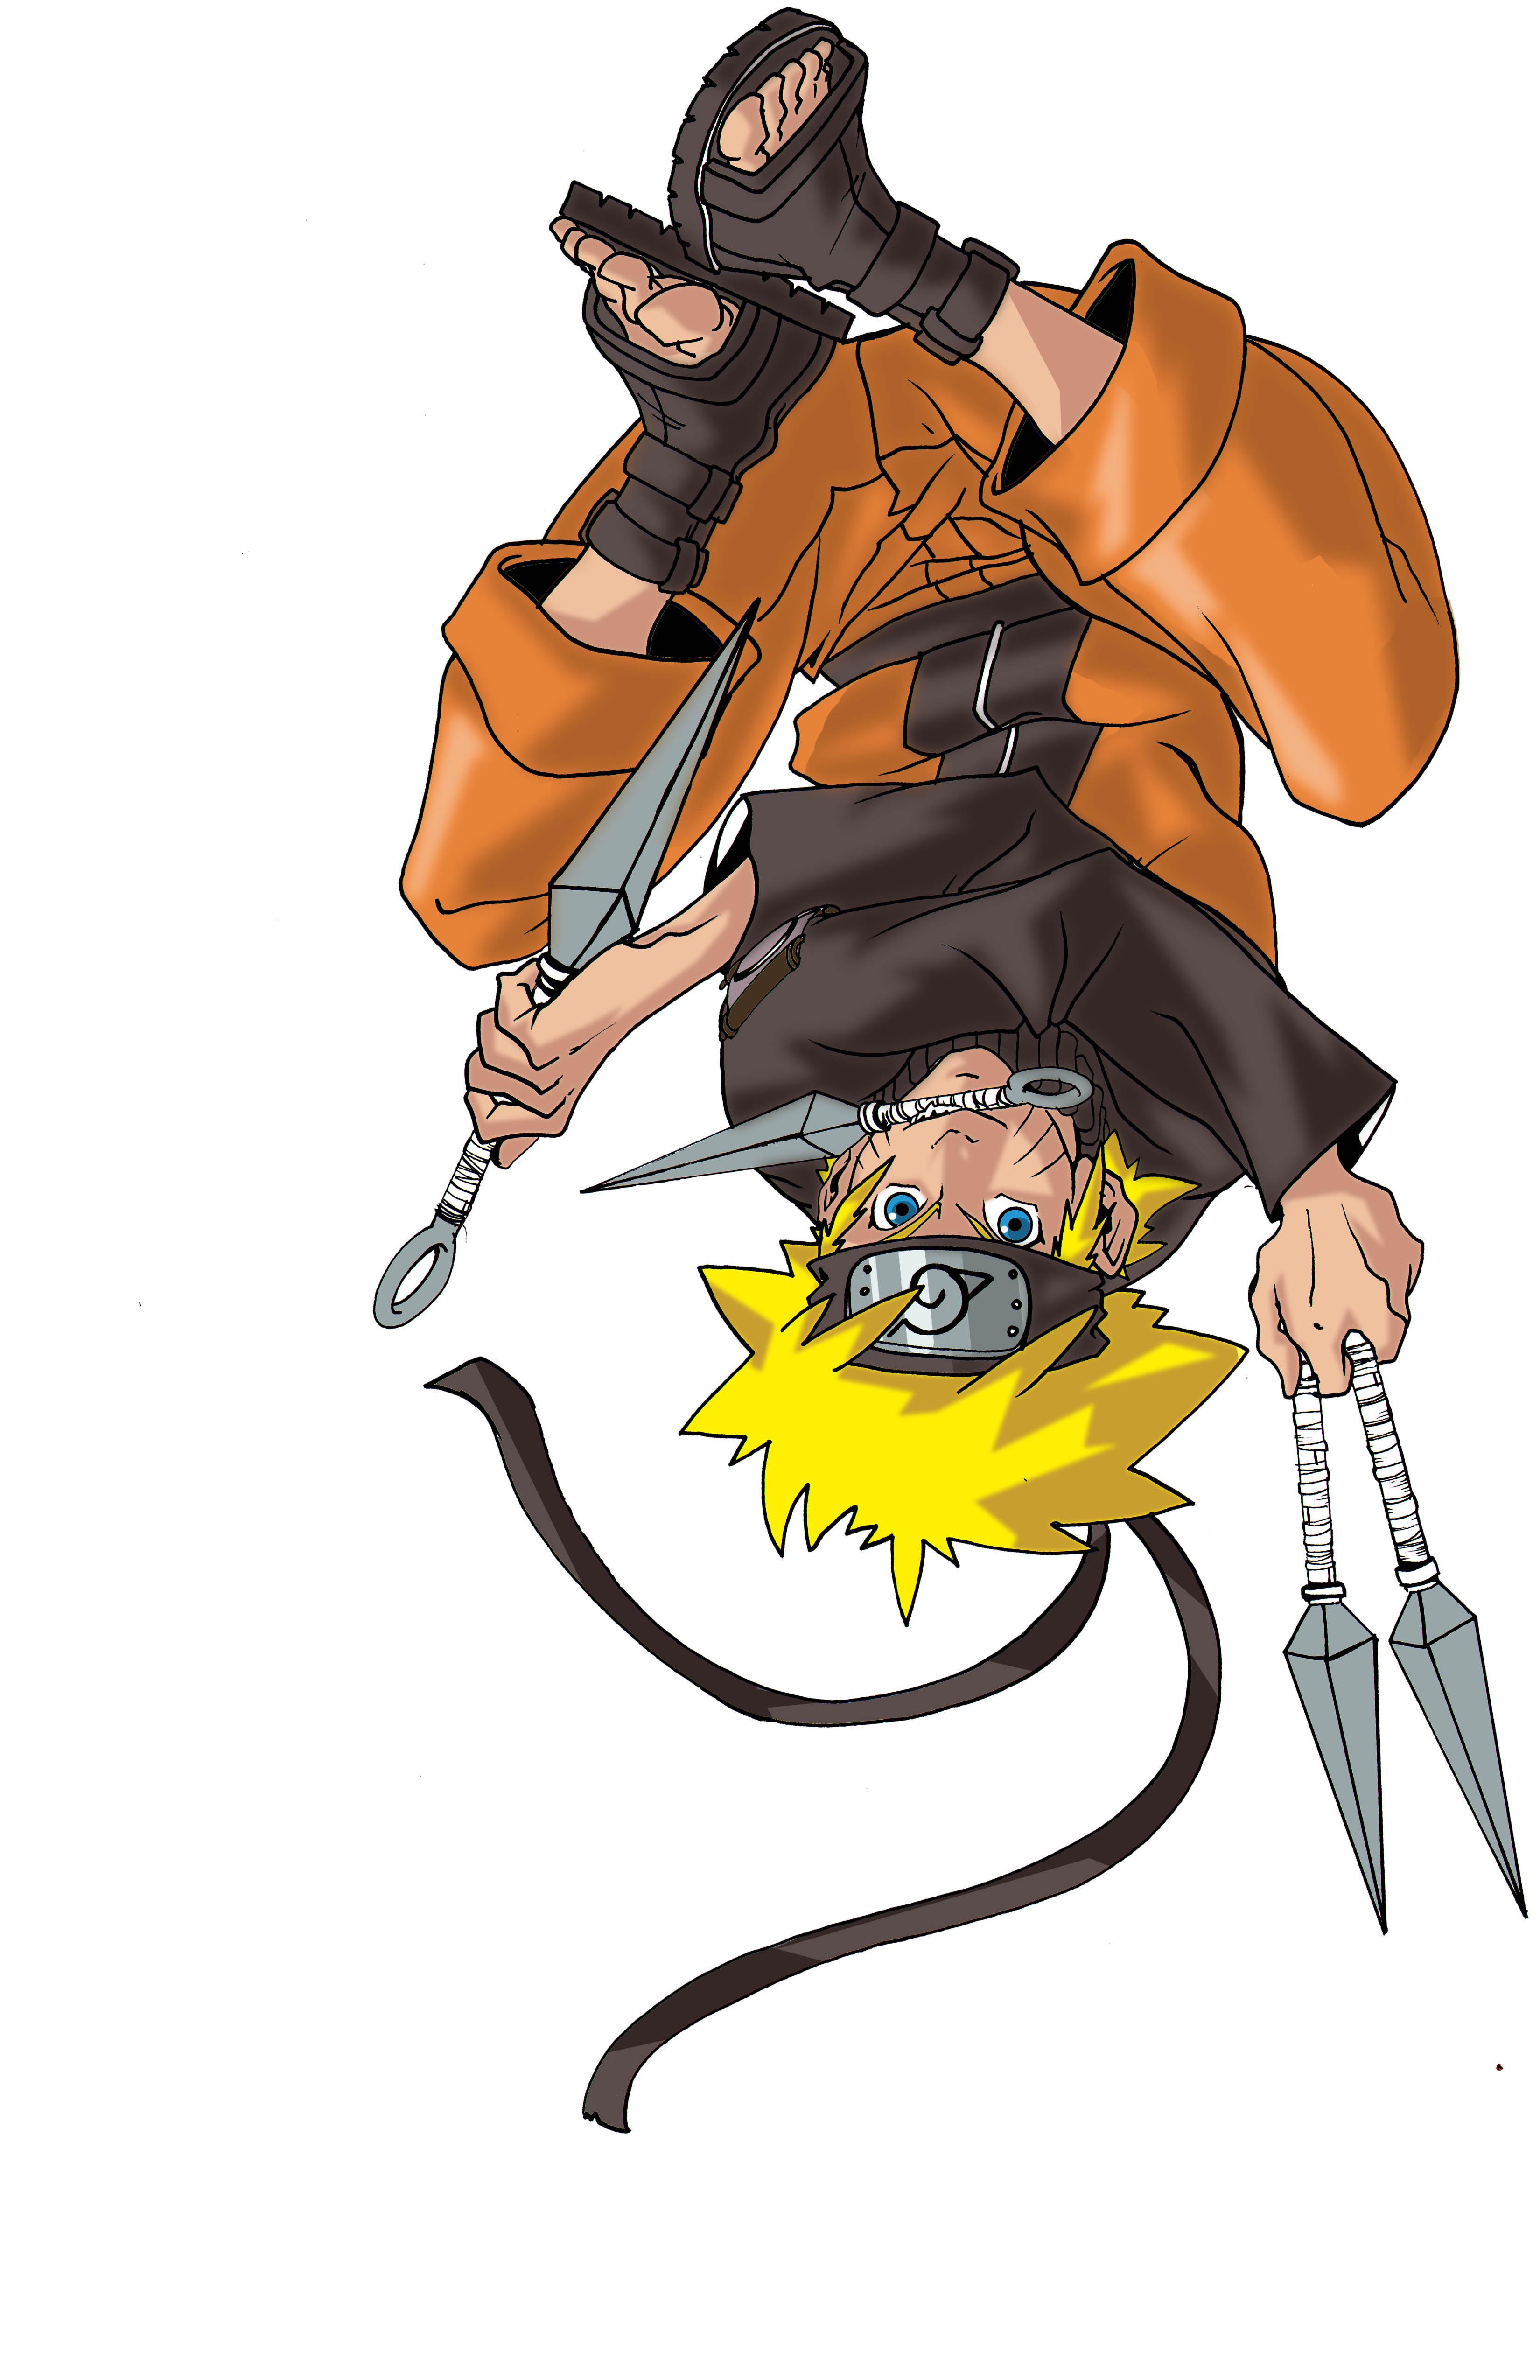 Naruto Shippuden Uzumaki Upside Down Simple Background